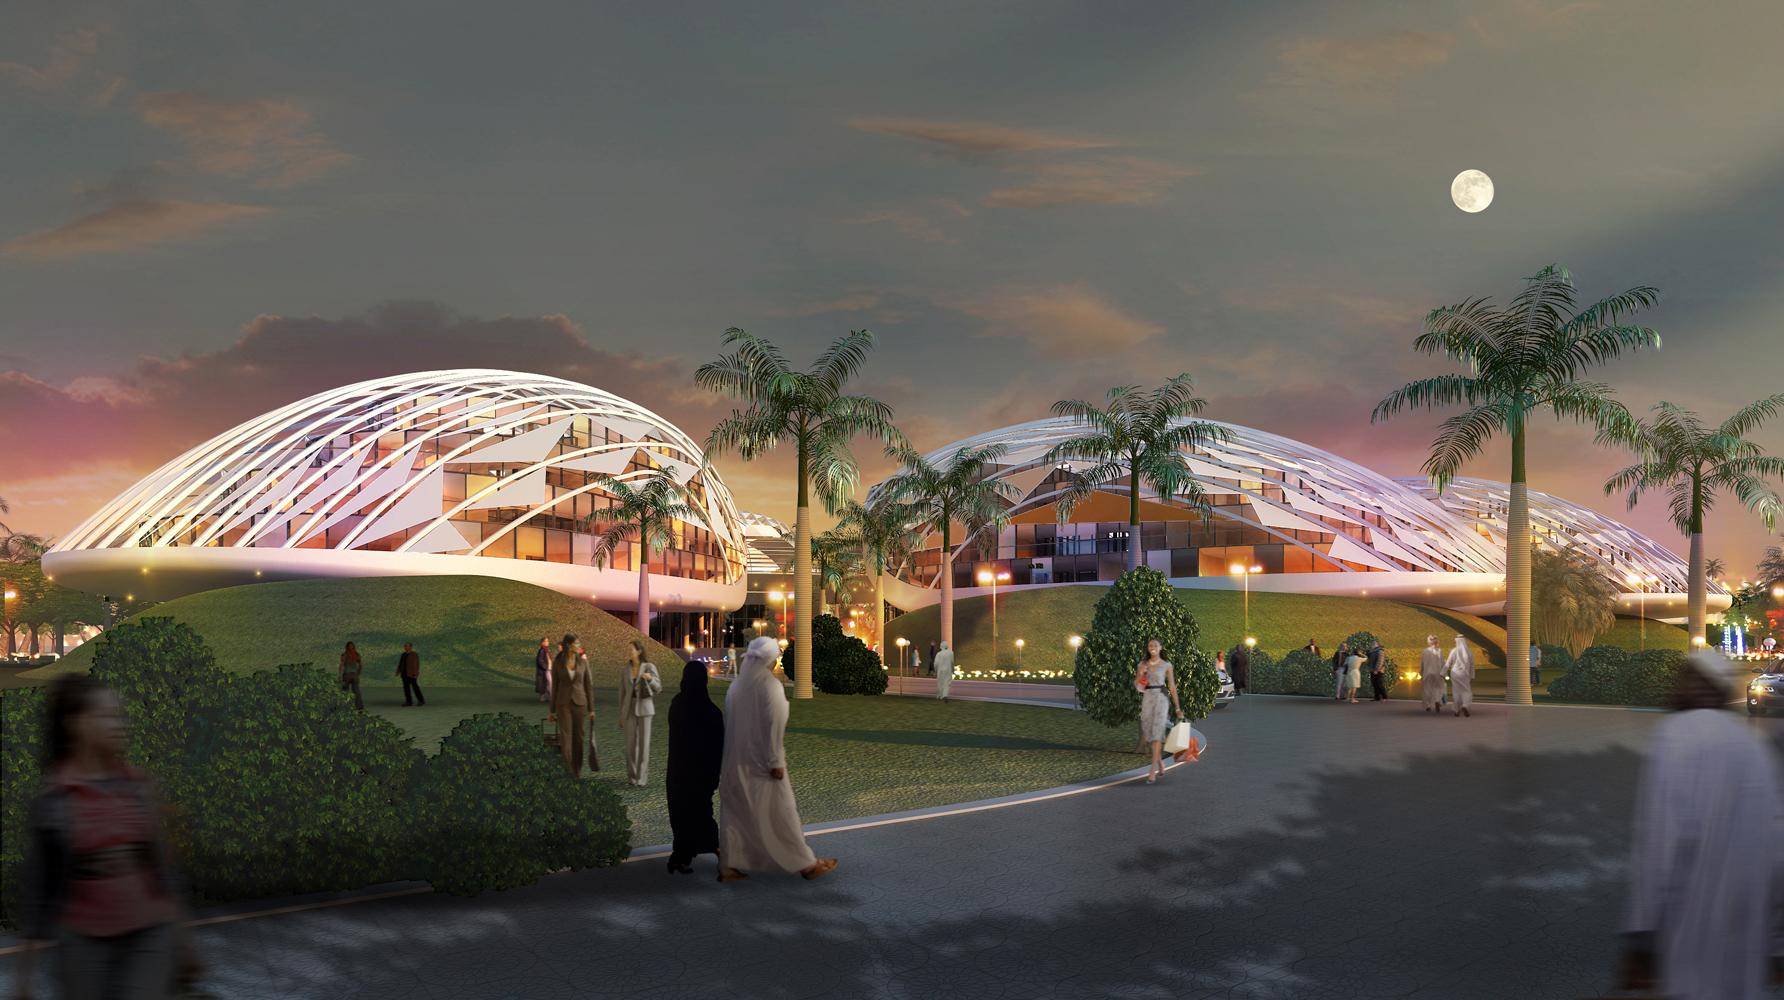 BEAD Mushrif Abu Dhabi Residential night view.JPG